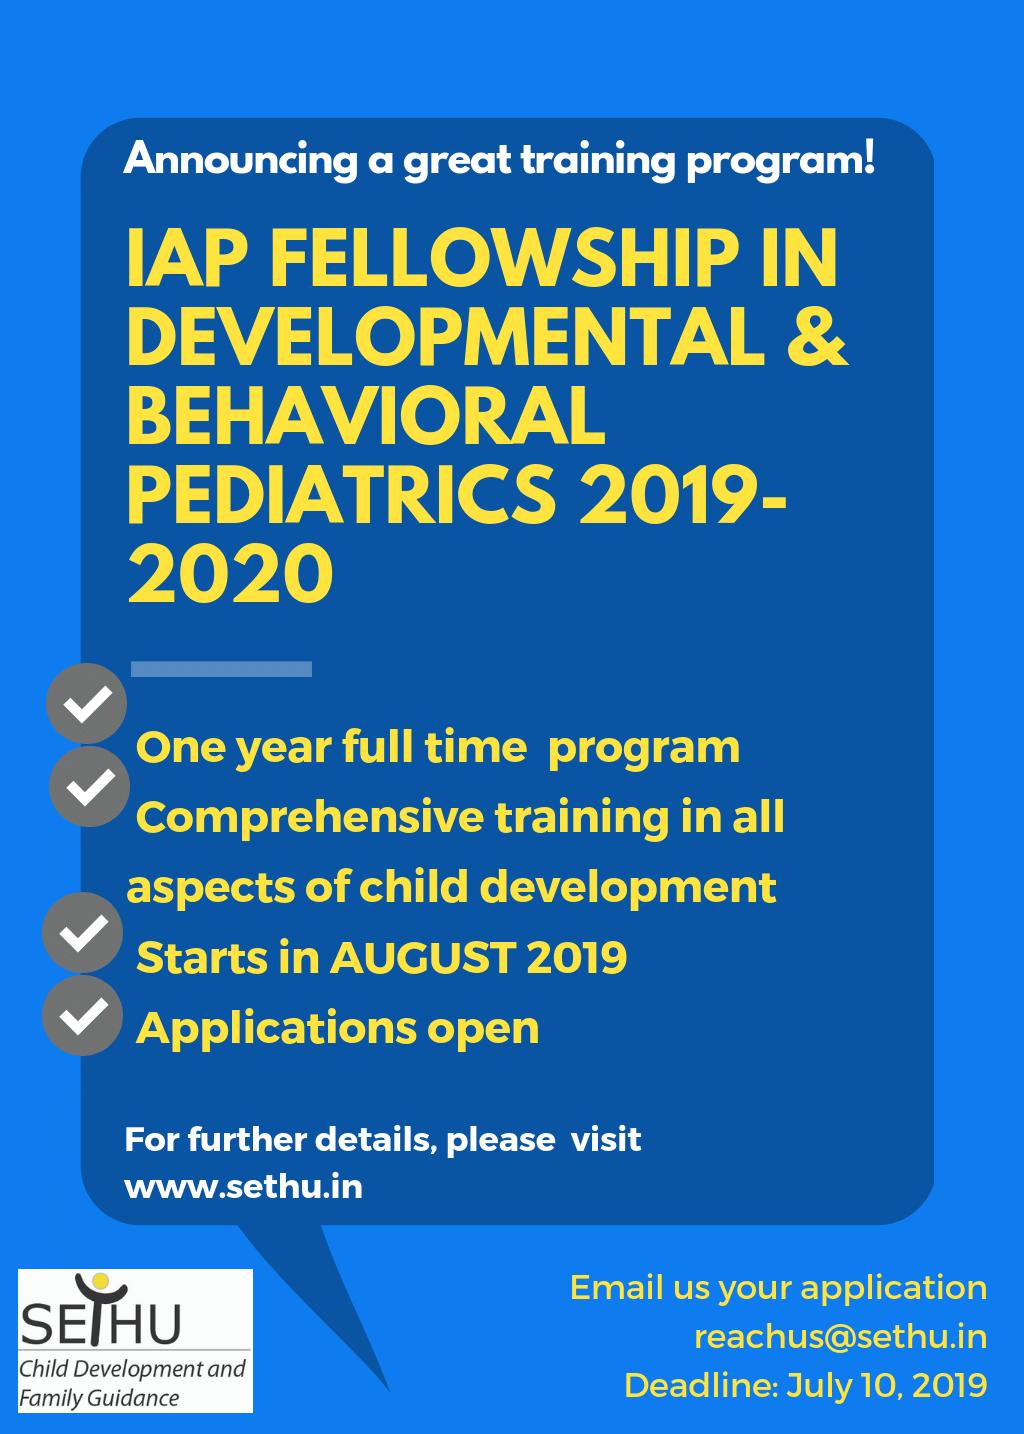 IAP Fellowship in Developmental and Behavioural Pediatrics – Sethu